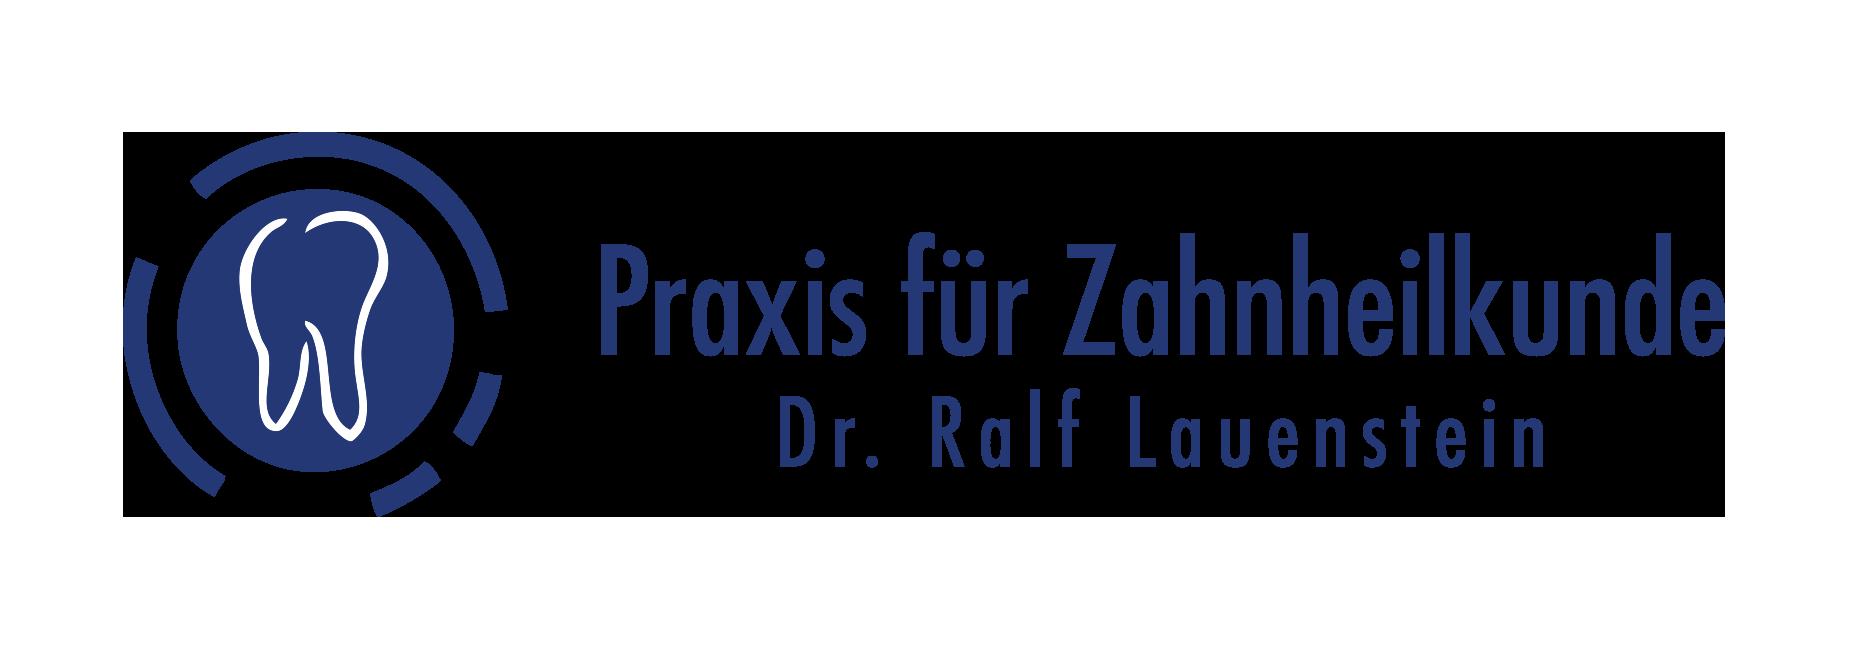 Angstpatienten - Behandlung | Zahnarzt Dr. Lauenstein in Bremen